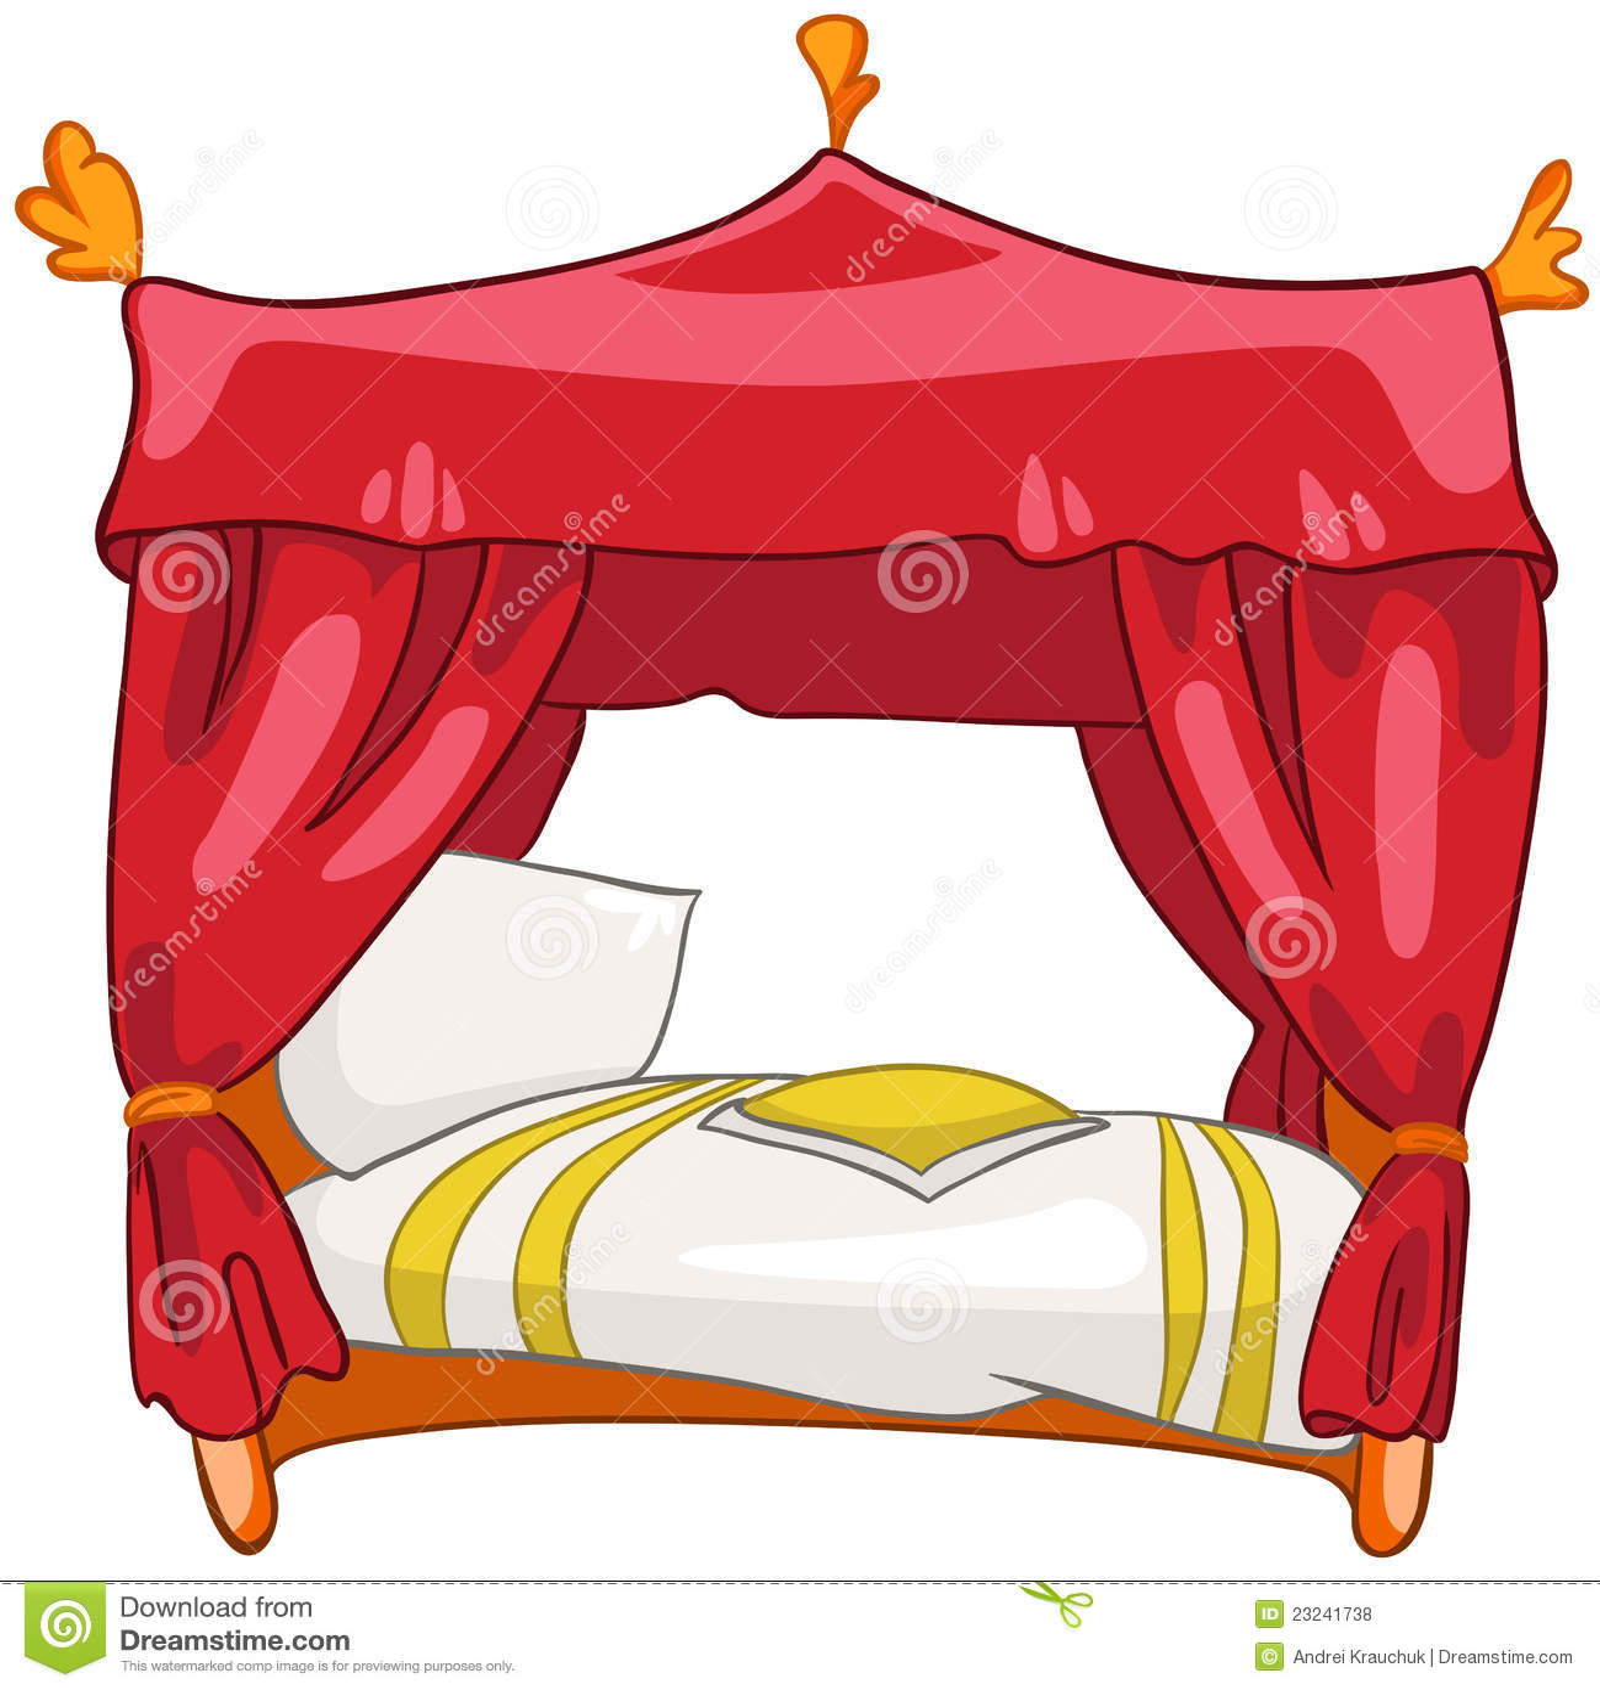 Cartoon Furniture: Cartoon Home Furniture Bed Royalty Free Stock Photos